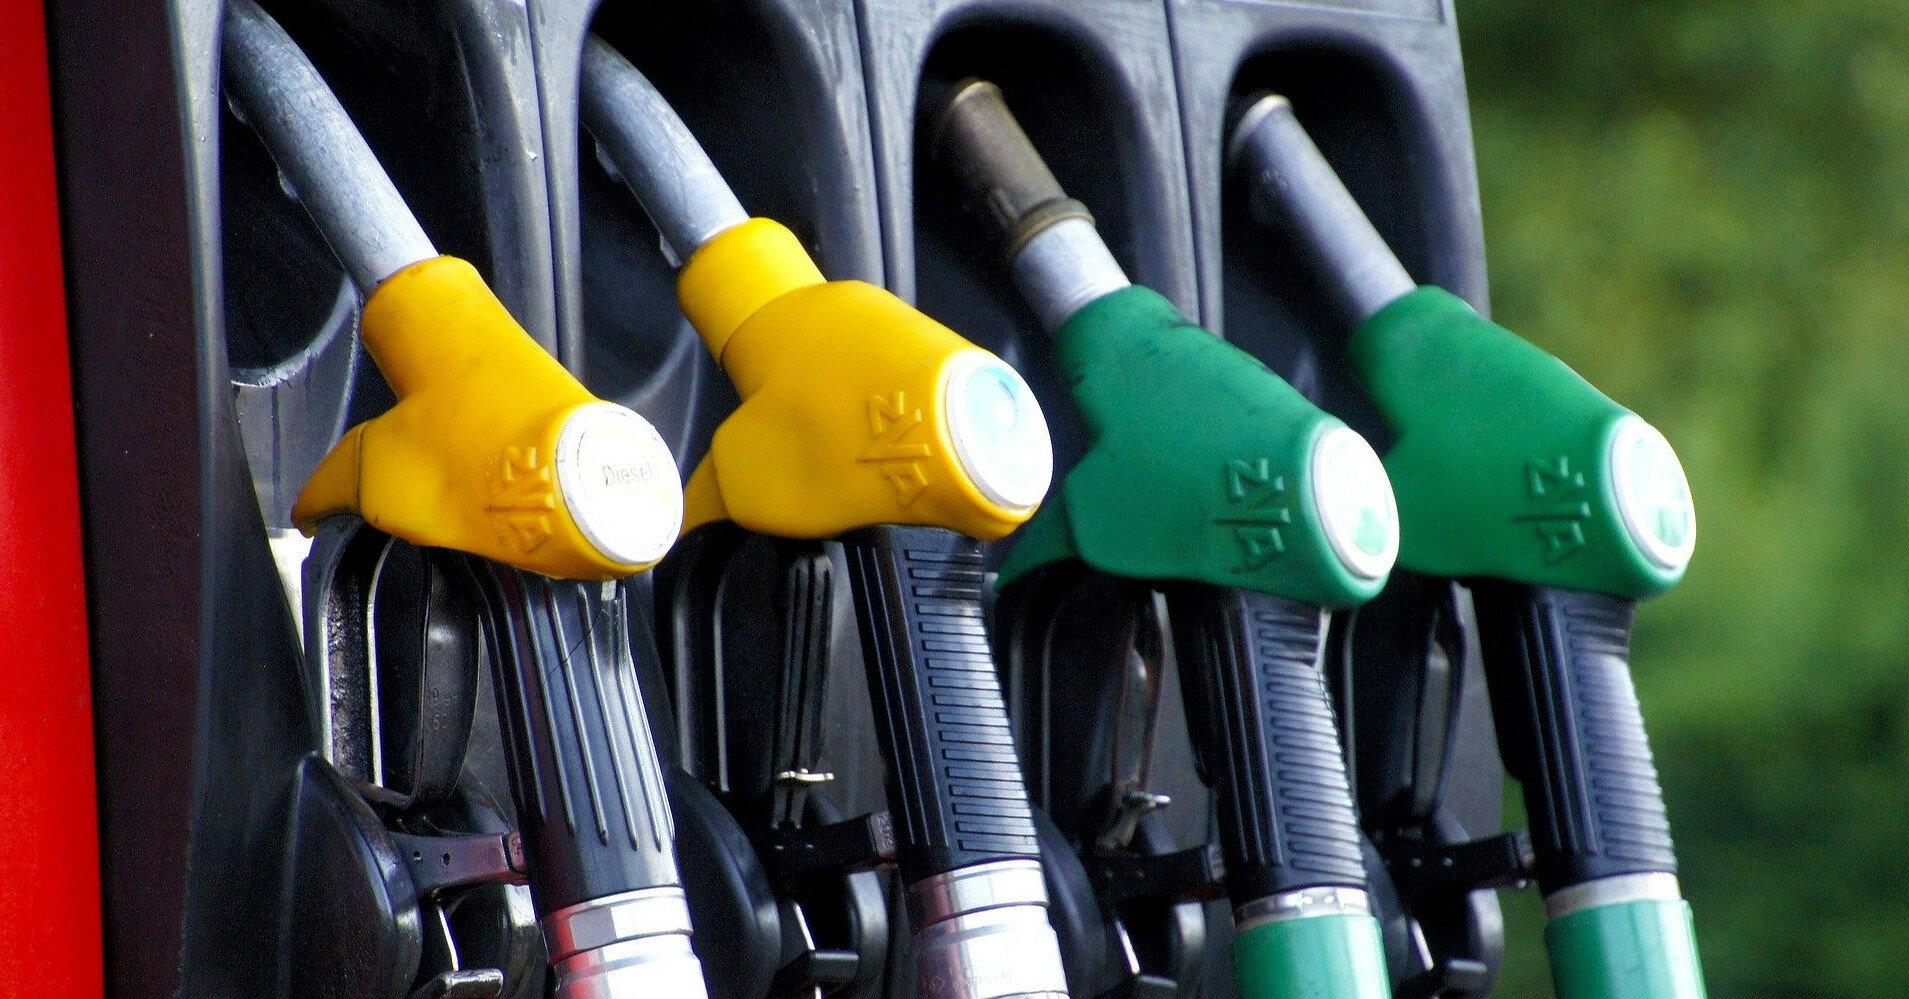 Рост цен на топливо прекратился